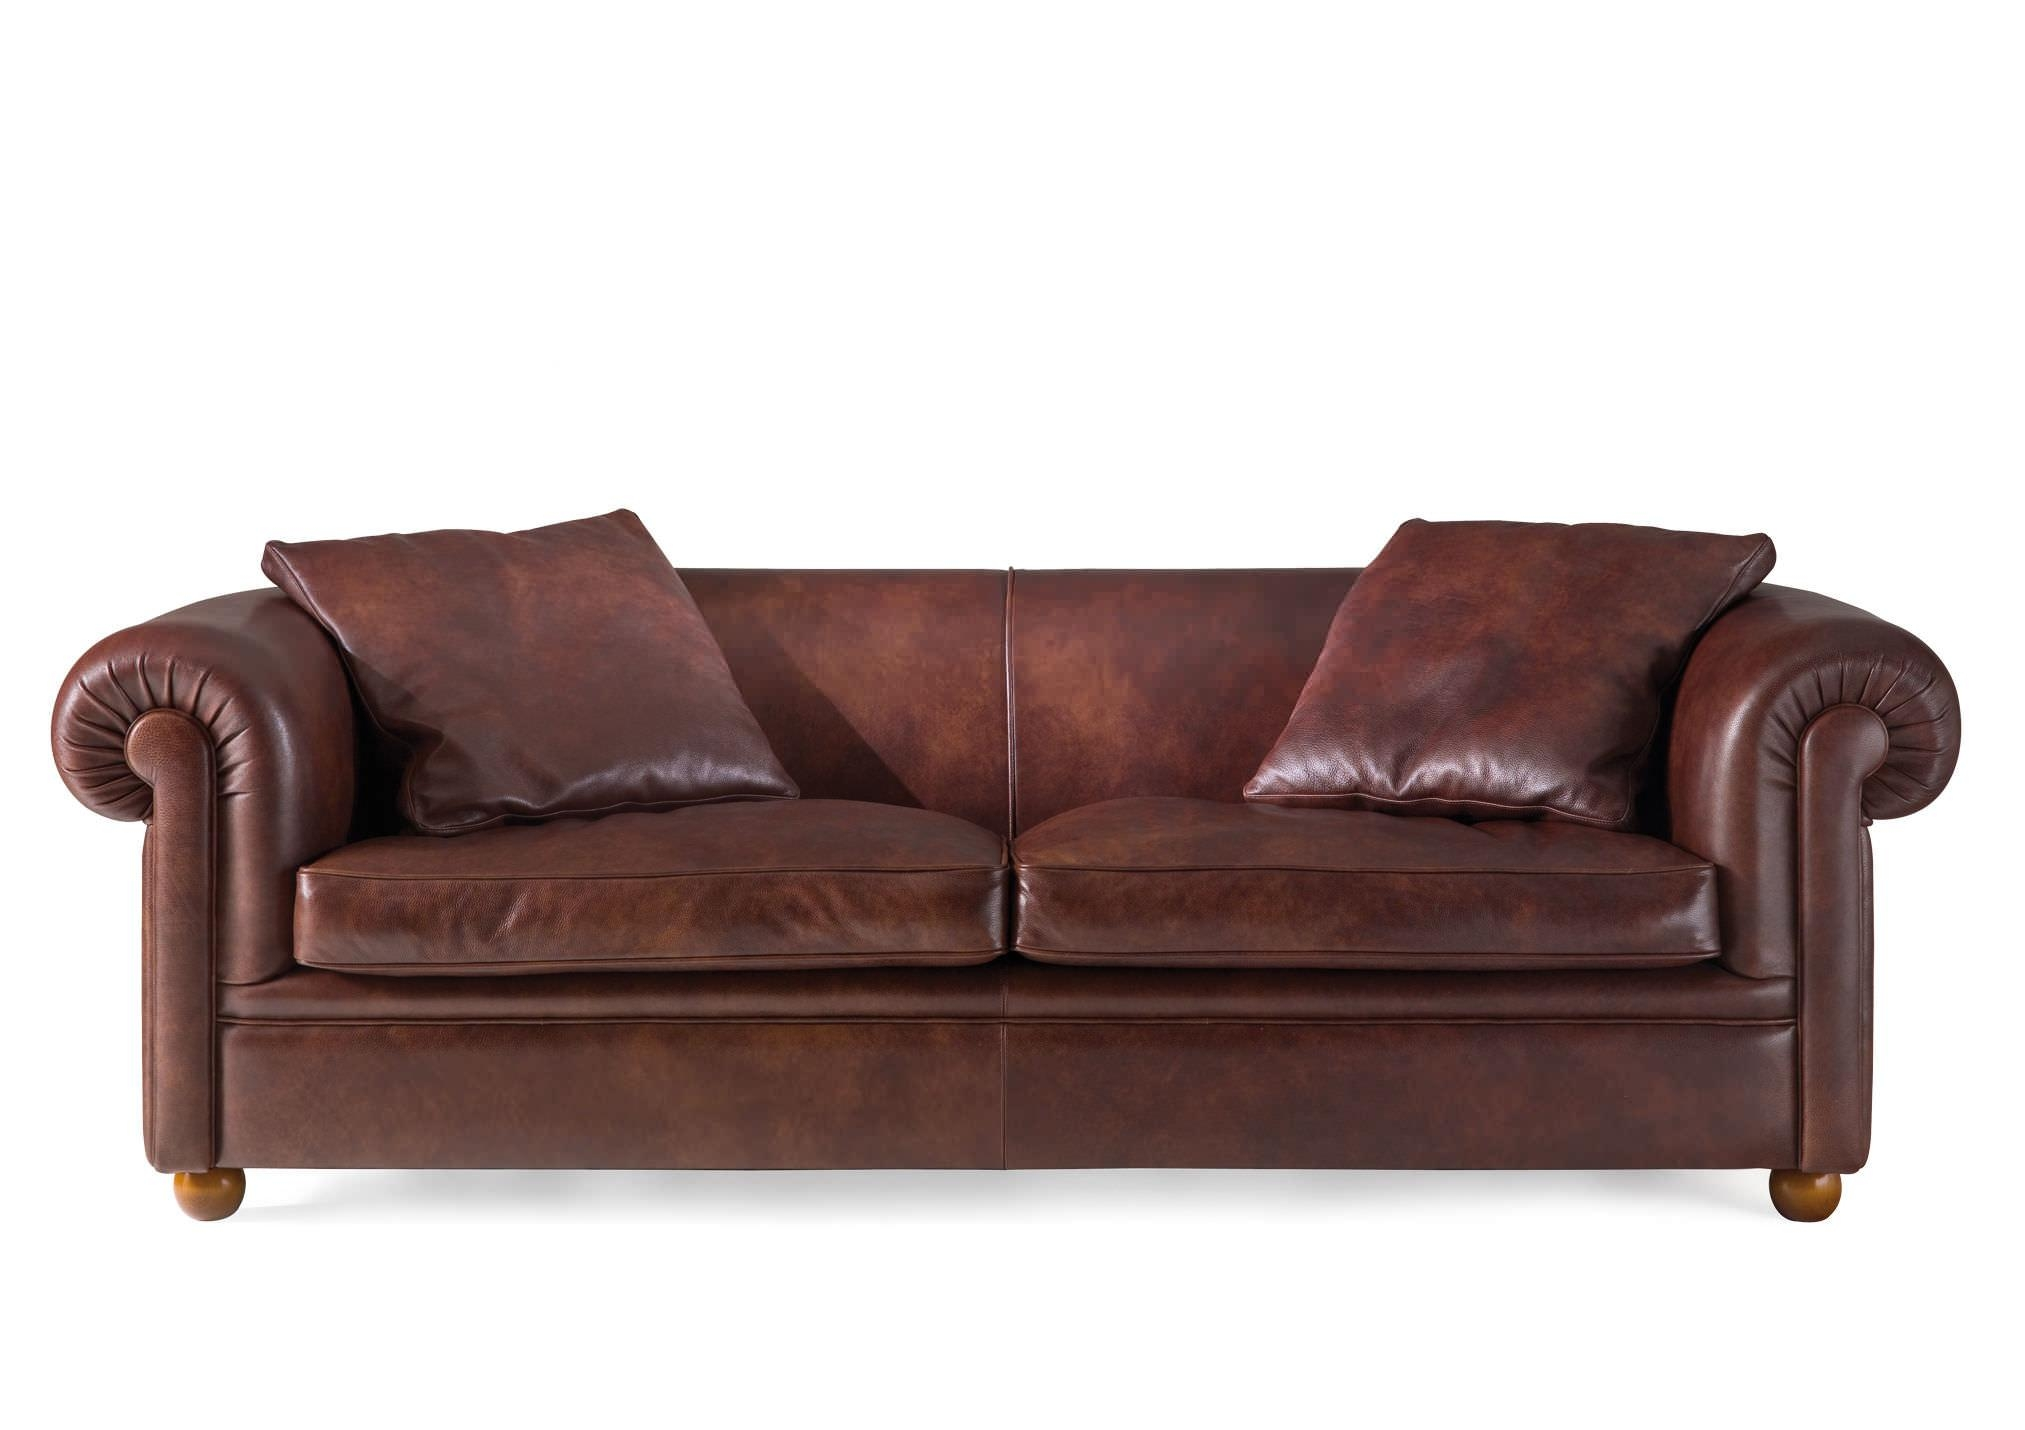 Leather Sofas Canterbury | Crepeloversca Intended For Canterbury Leather Sofas (View 7 of 20)